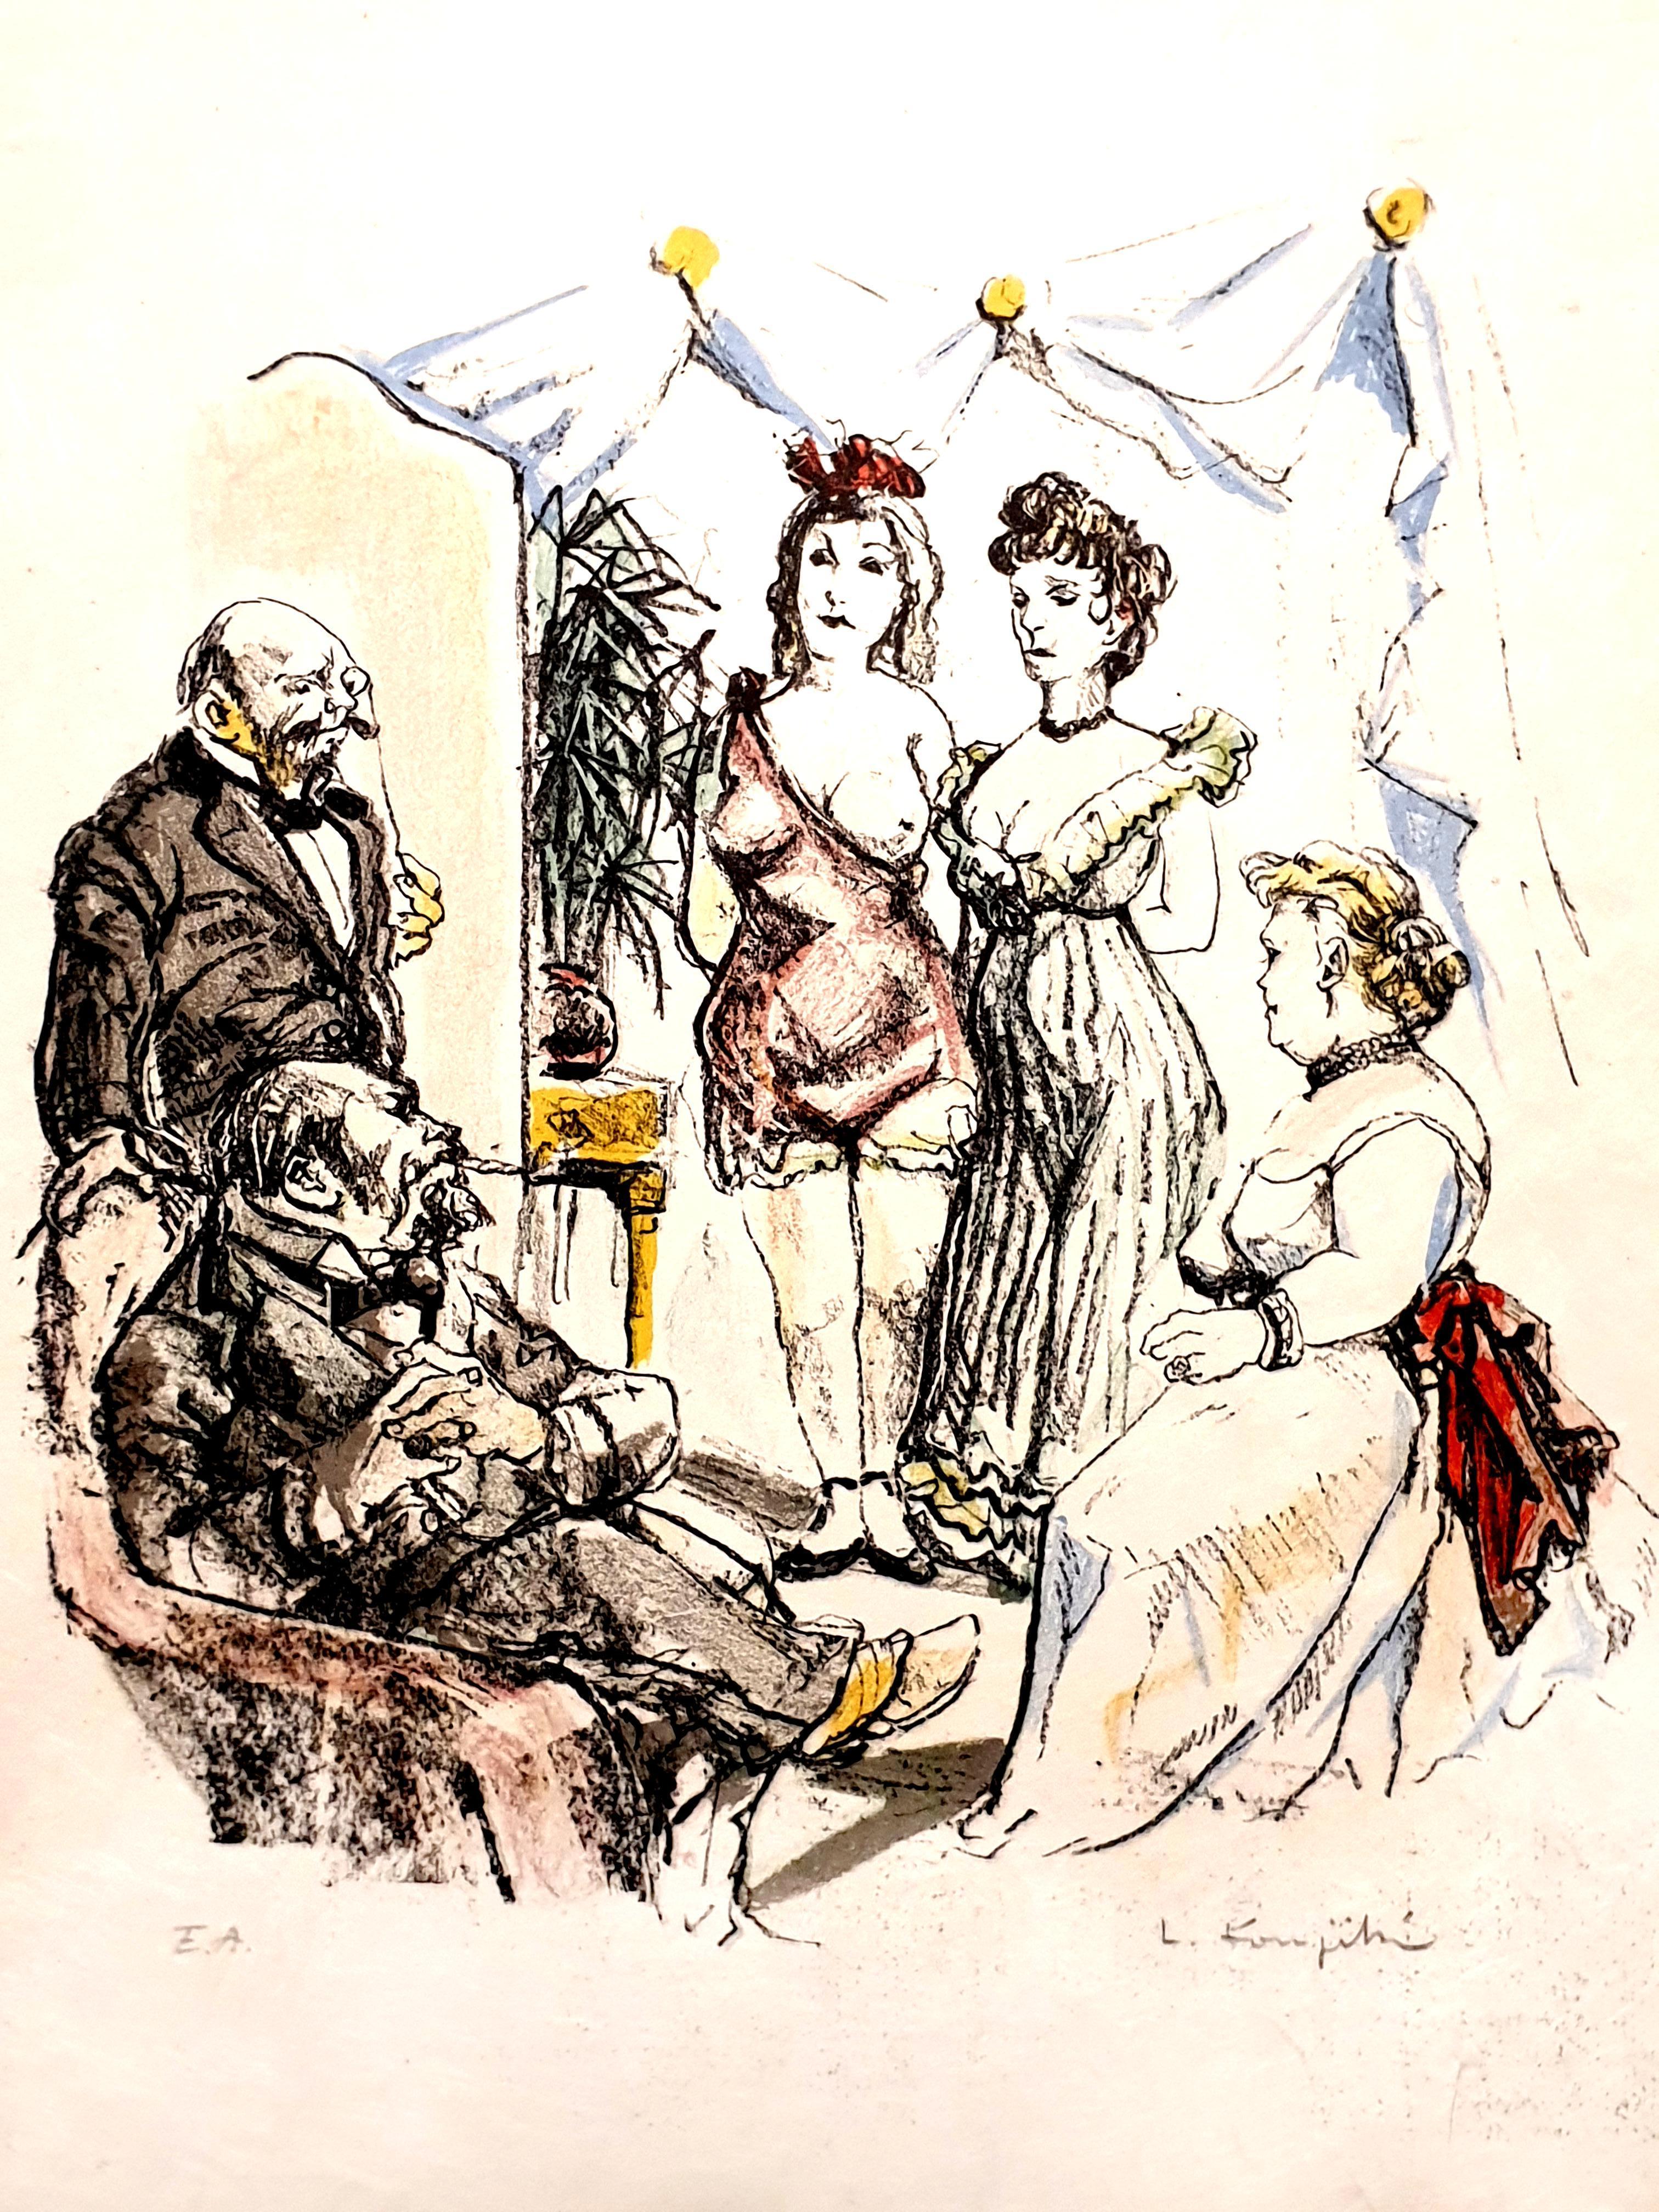 Leonard Foujita - House of Delights - Original Signed Lithograph